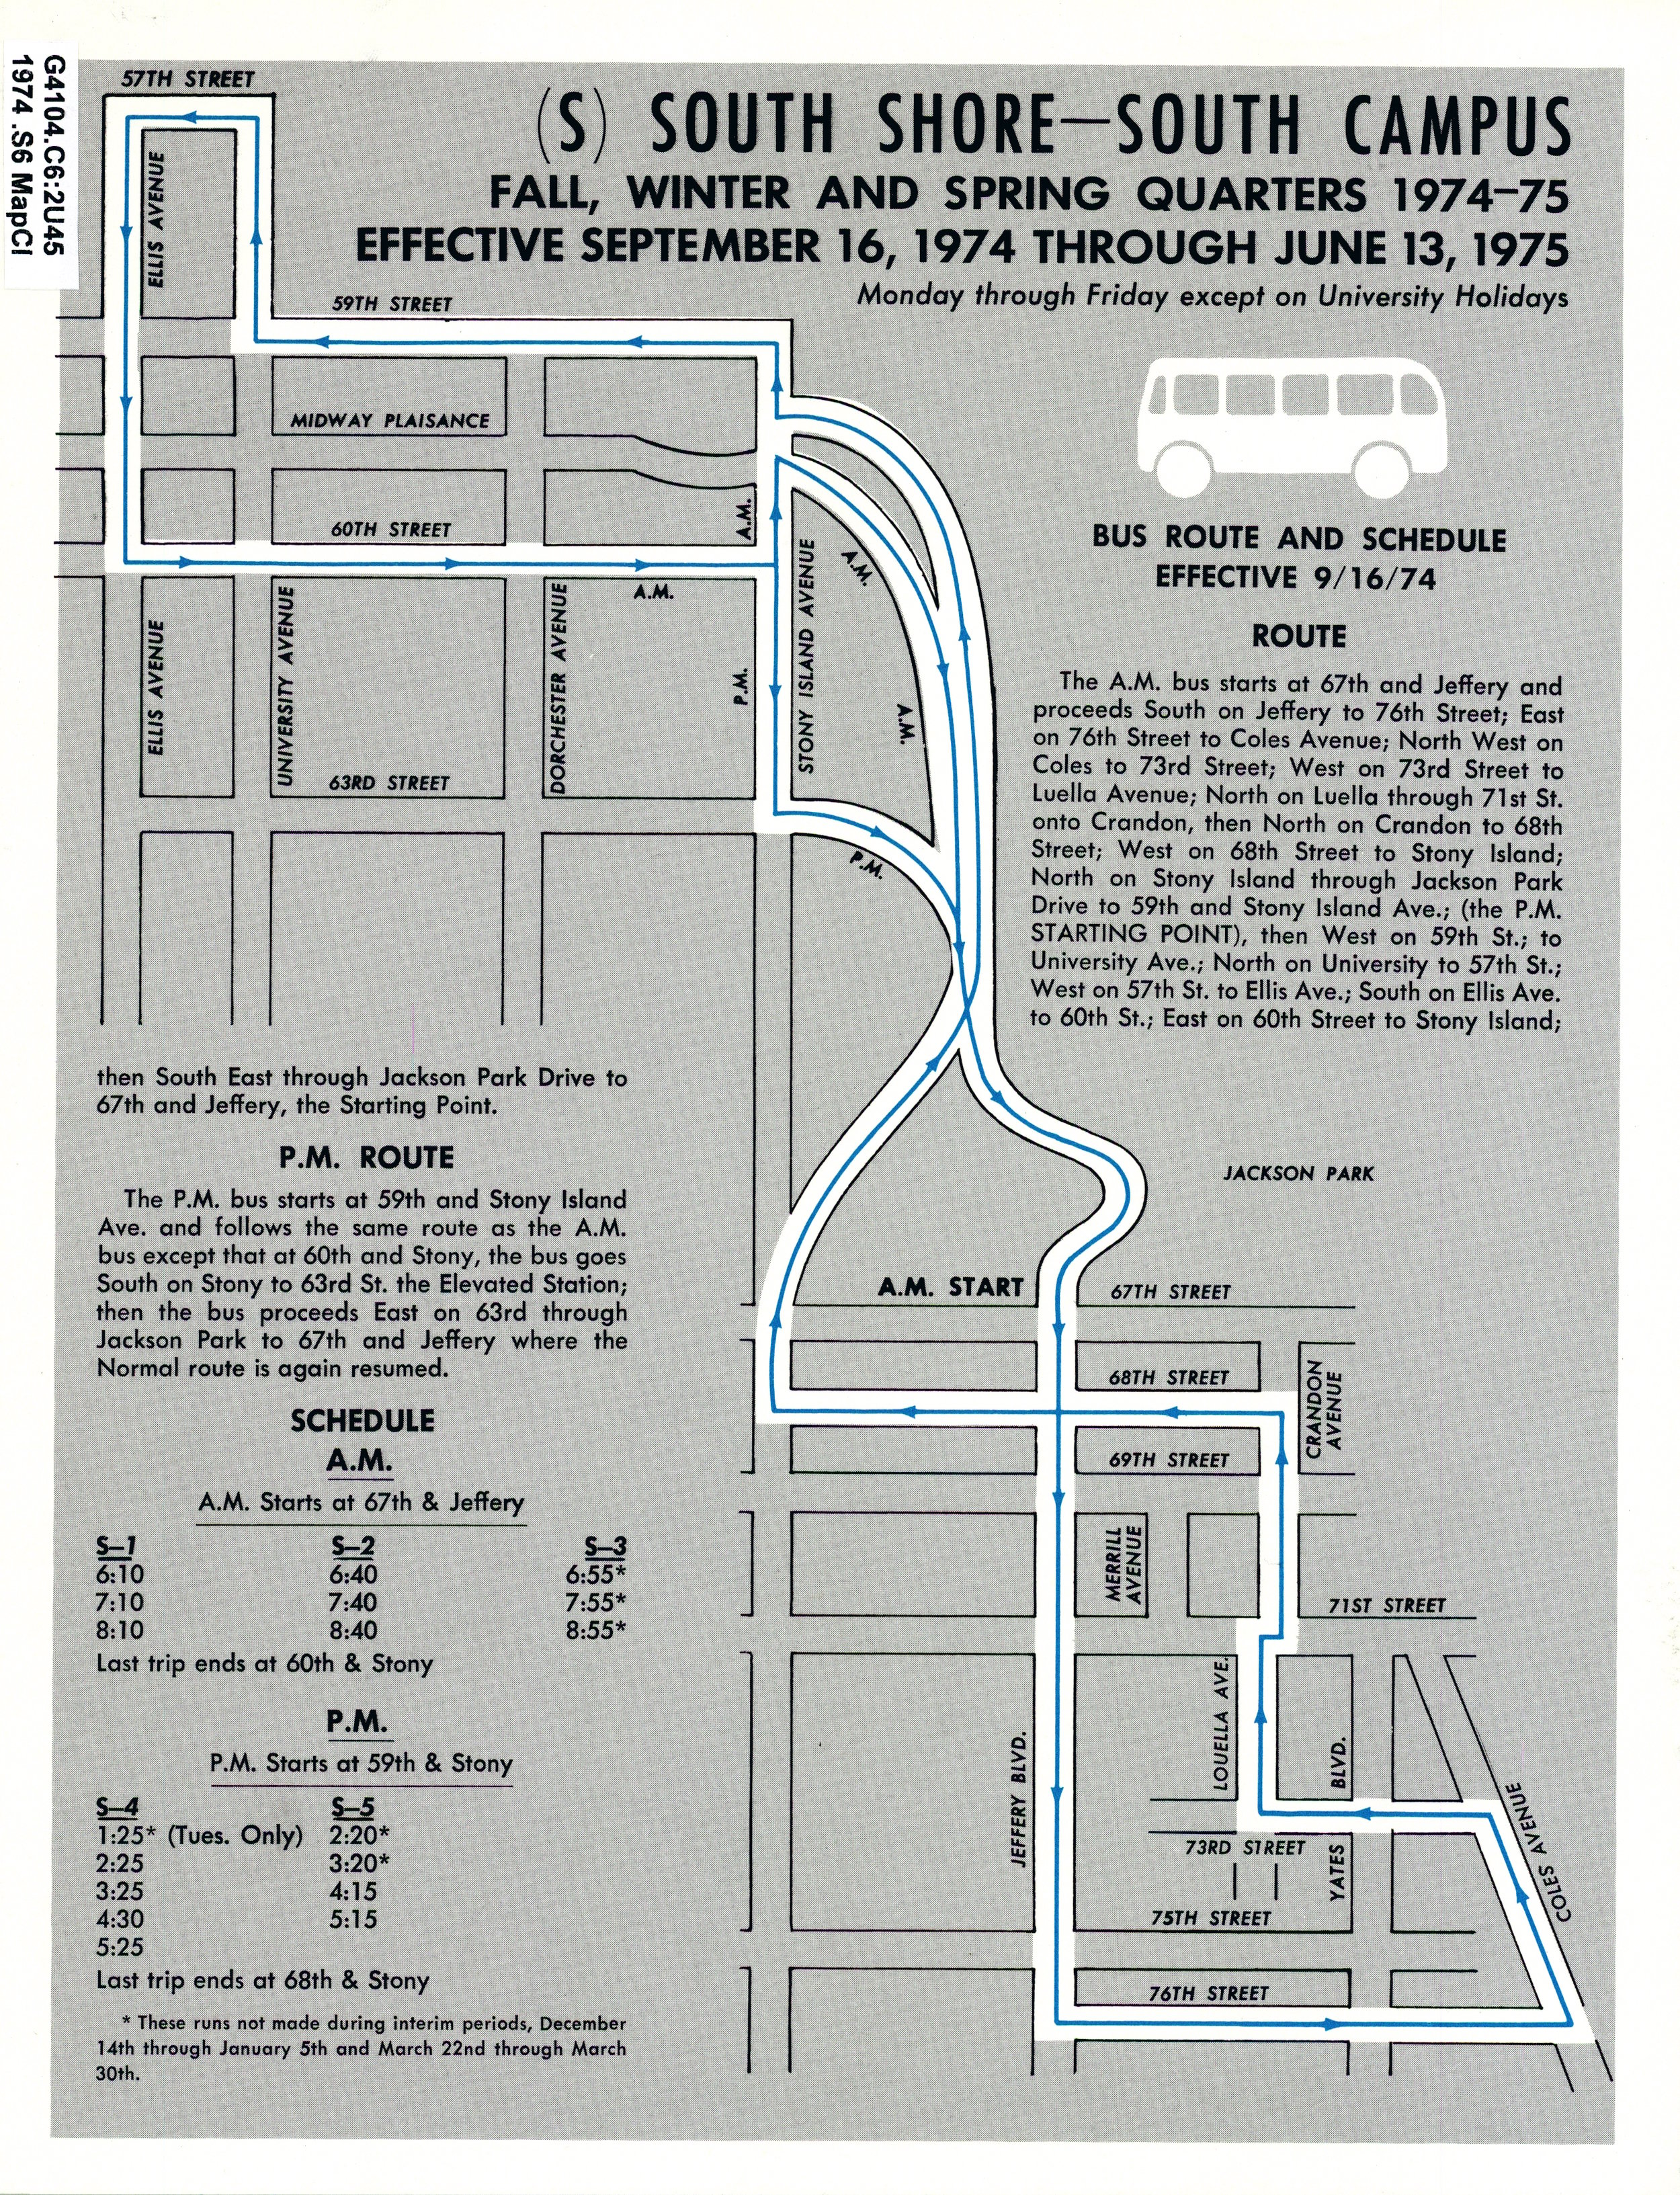 South Shore Shuttle, 1974-75